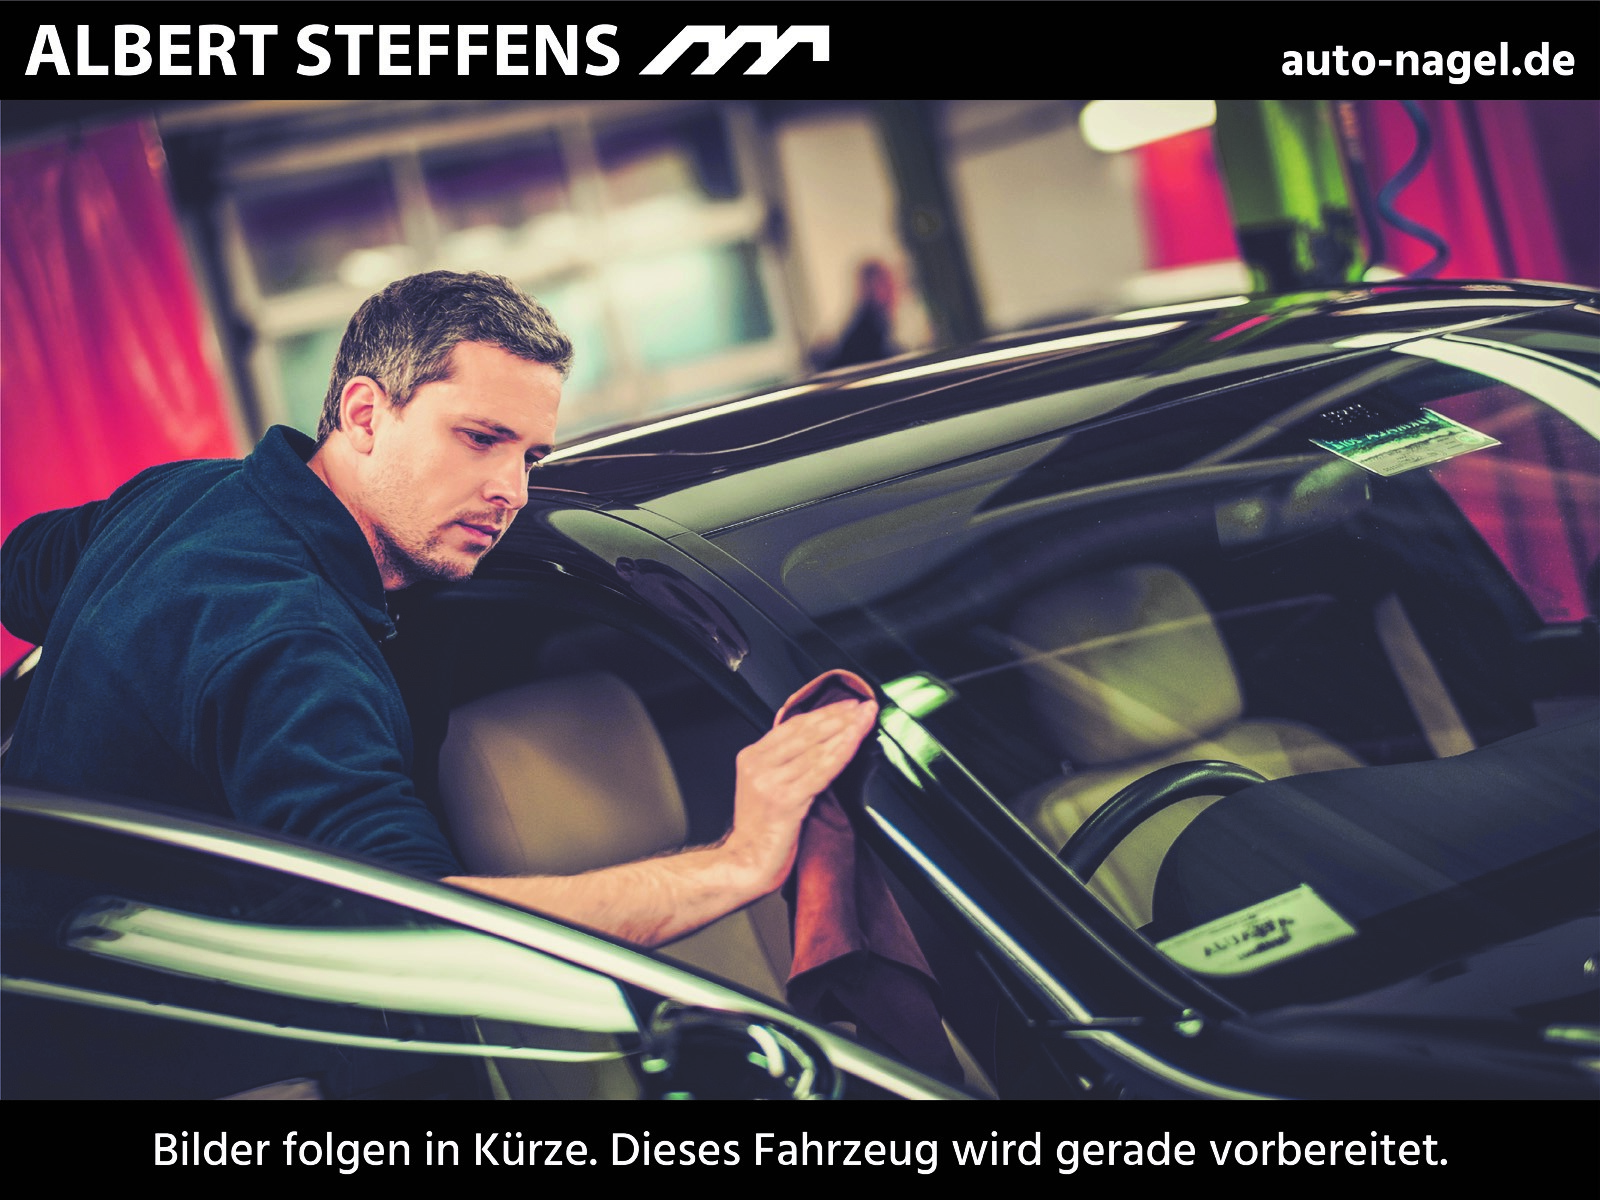 Mercedes-Benz SLK 350 AMG HarmanKardon+Ambiente+Xenon+PTS+SHZ+, Jahr 2015, Benzin